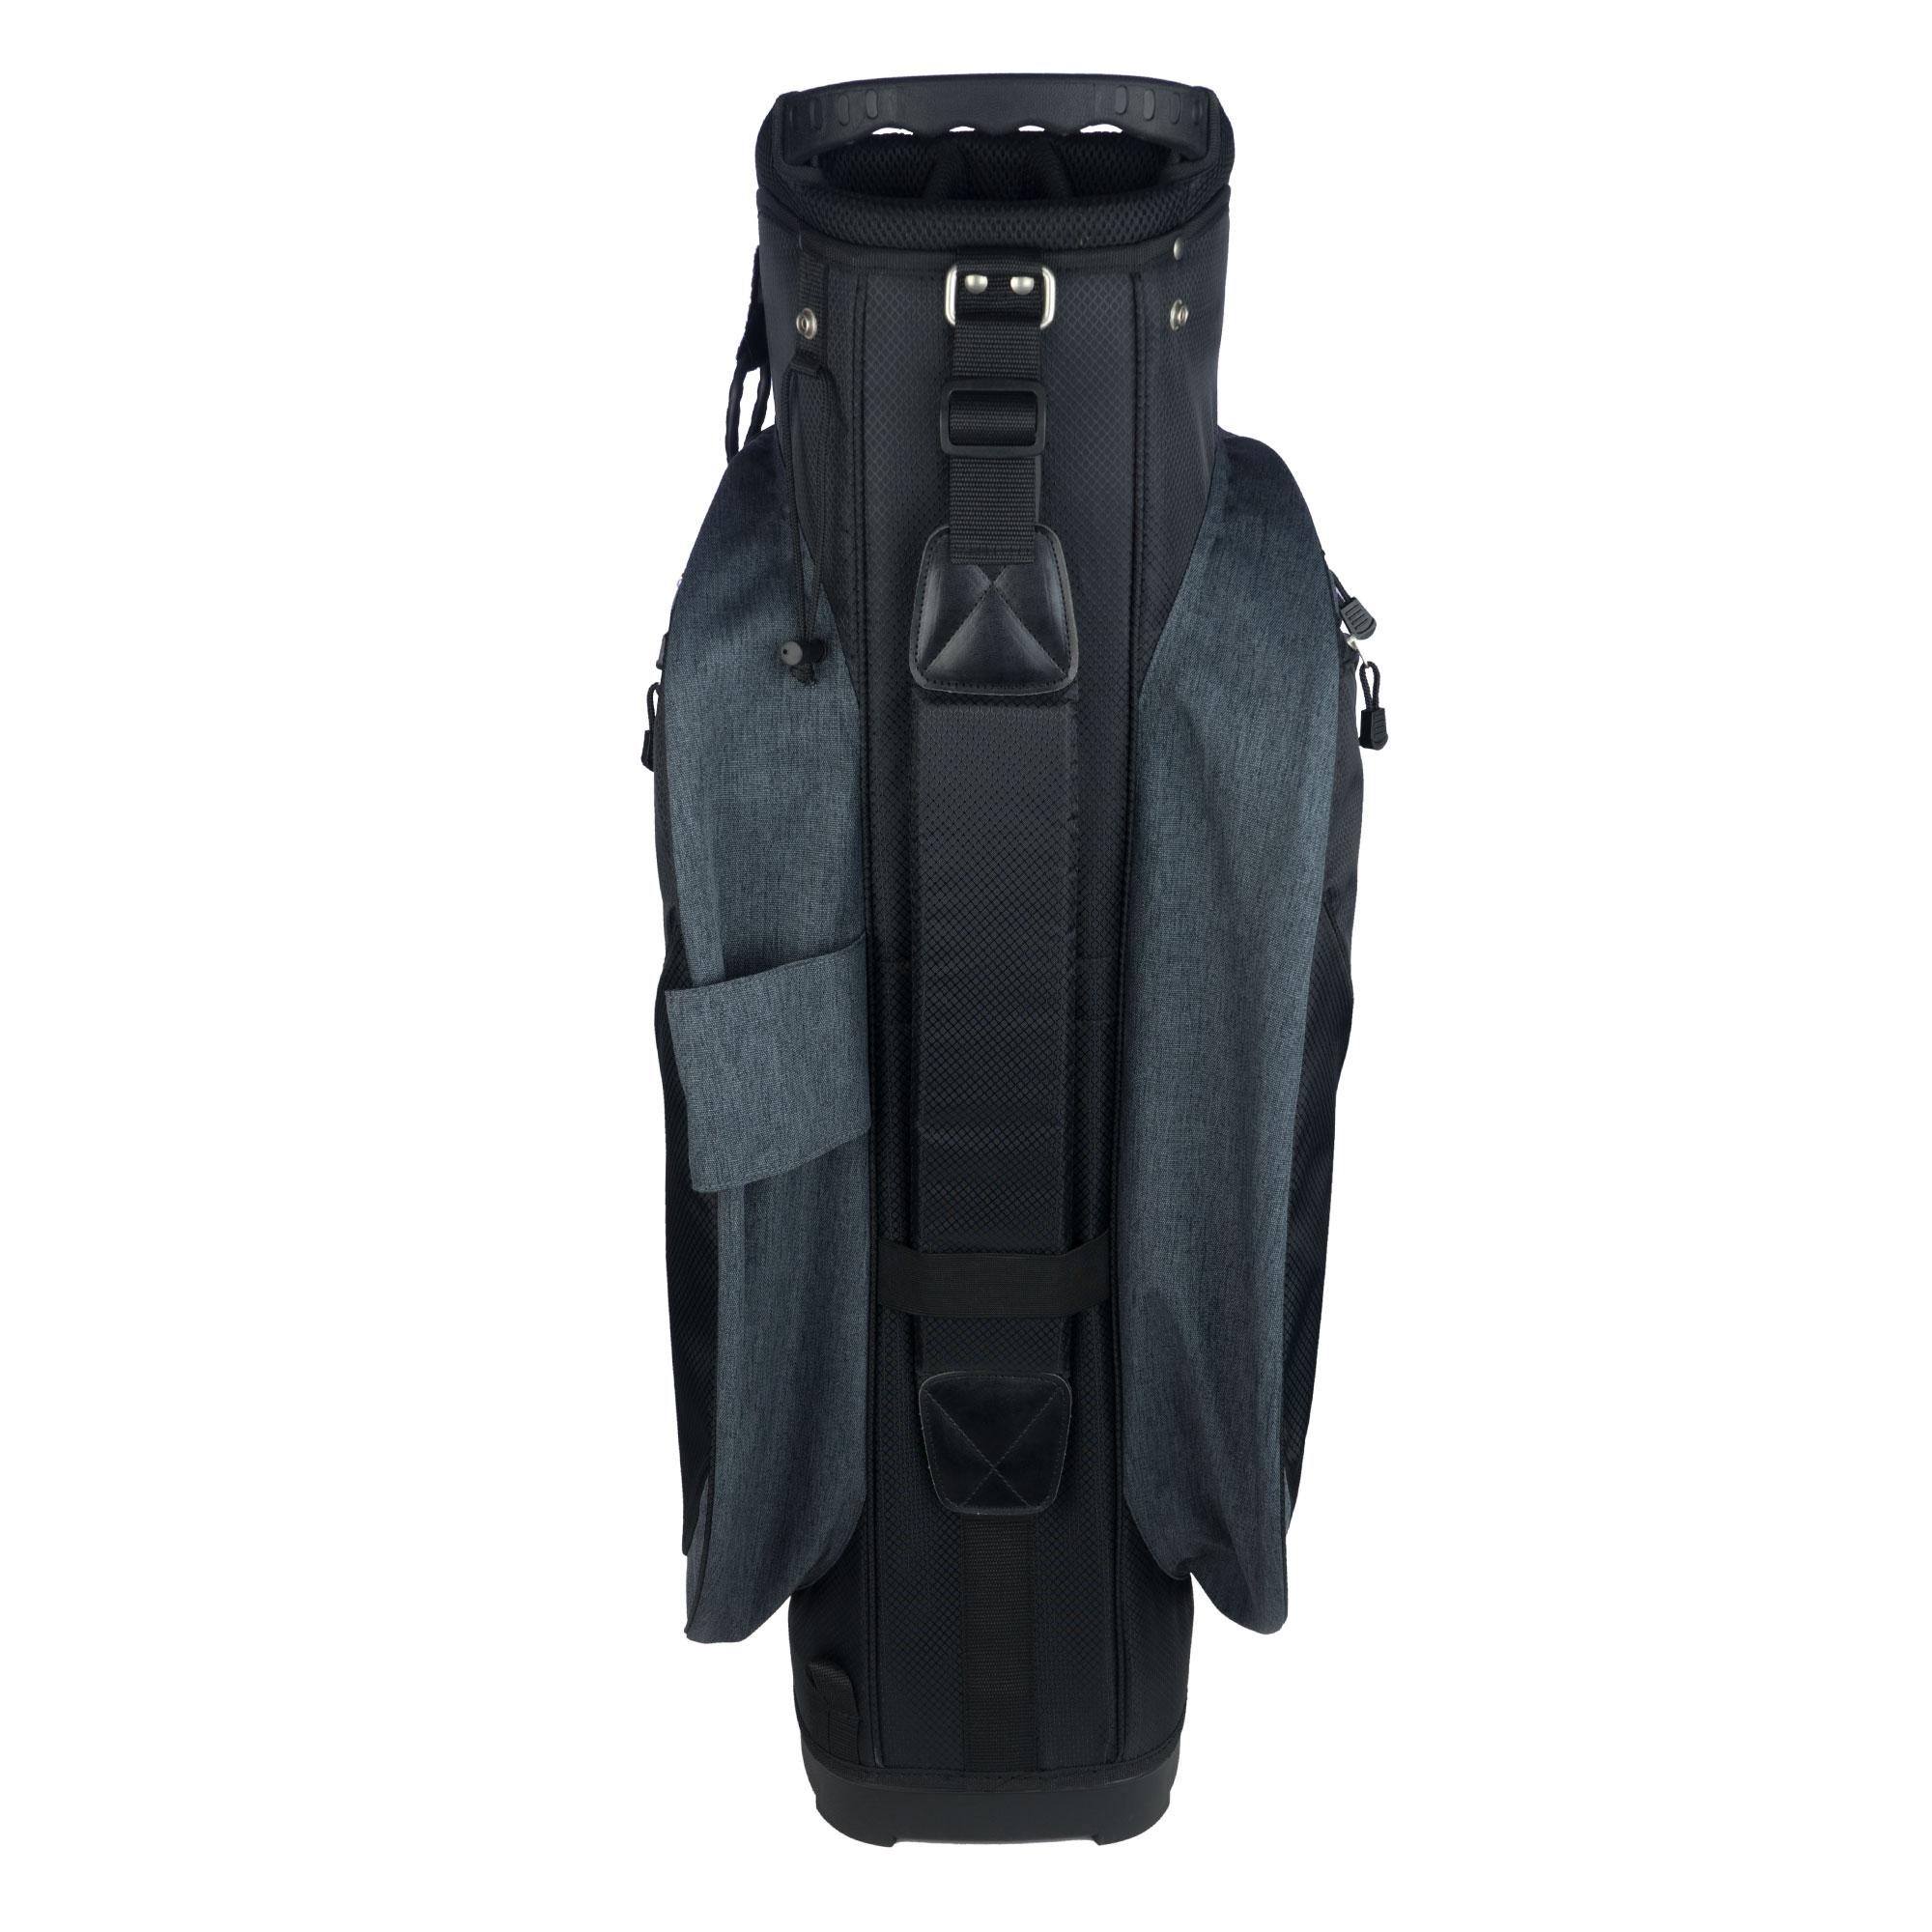 0892fab3d18 MG Golf Cart Bag image both-sides view. Qty: